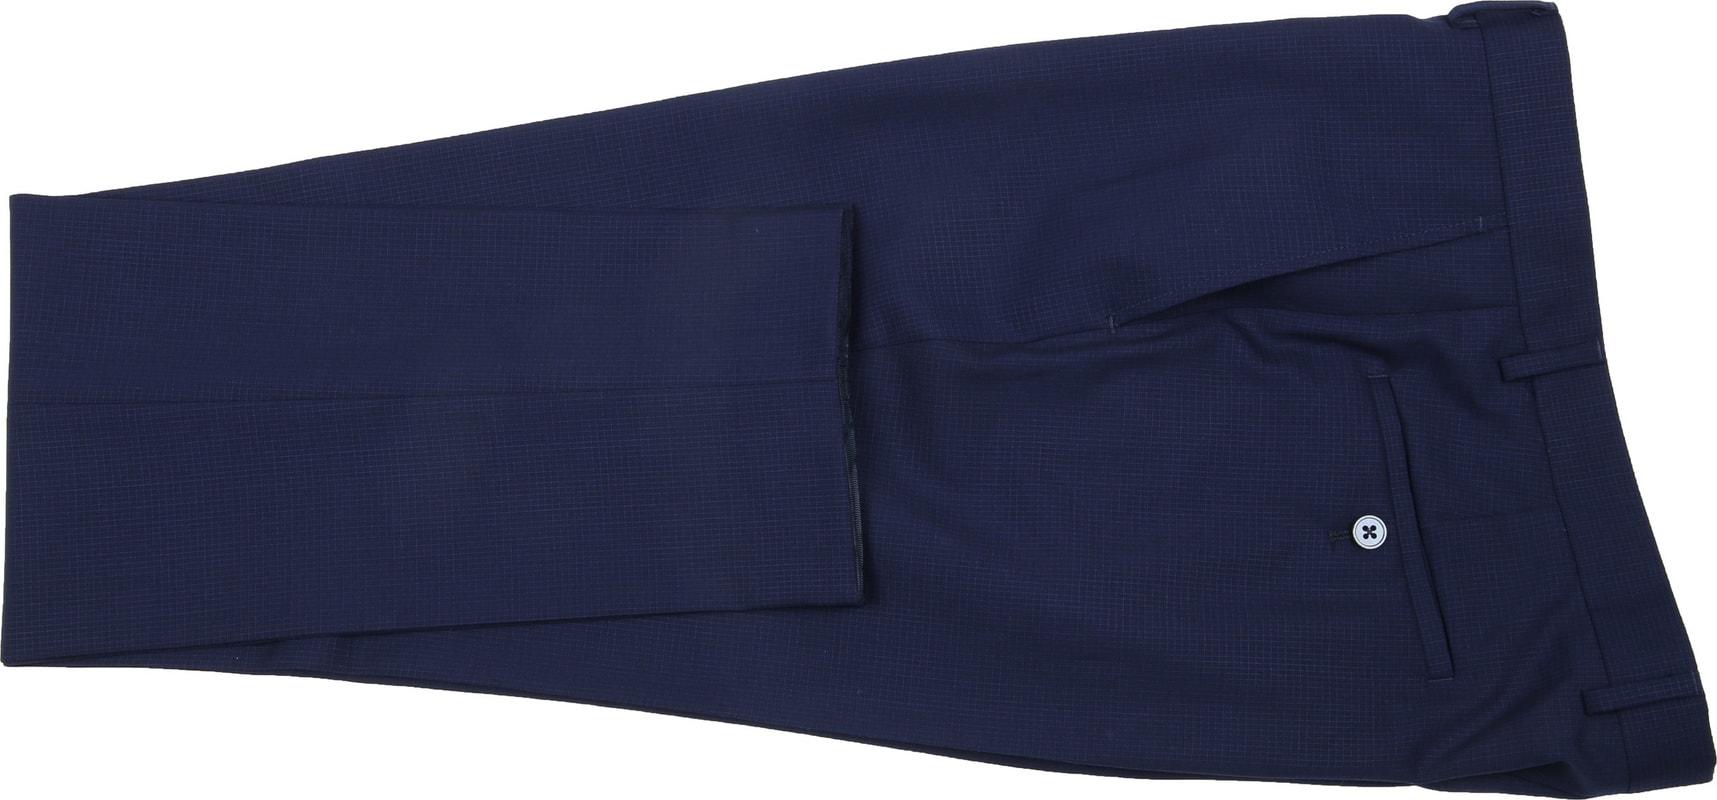 Suitable Anzug Strato Tegea Navy Foto 5